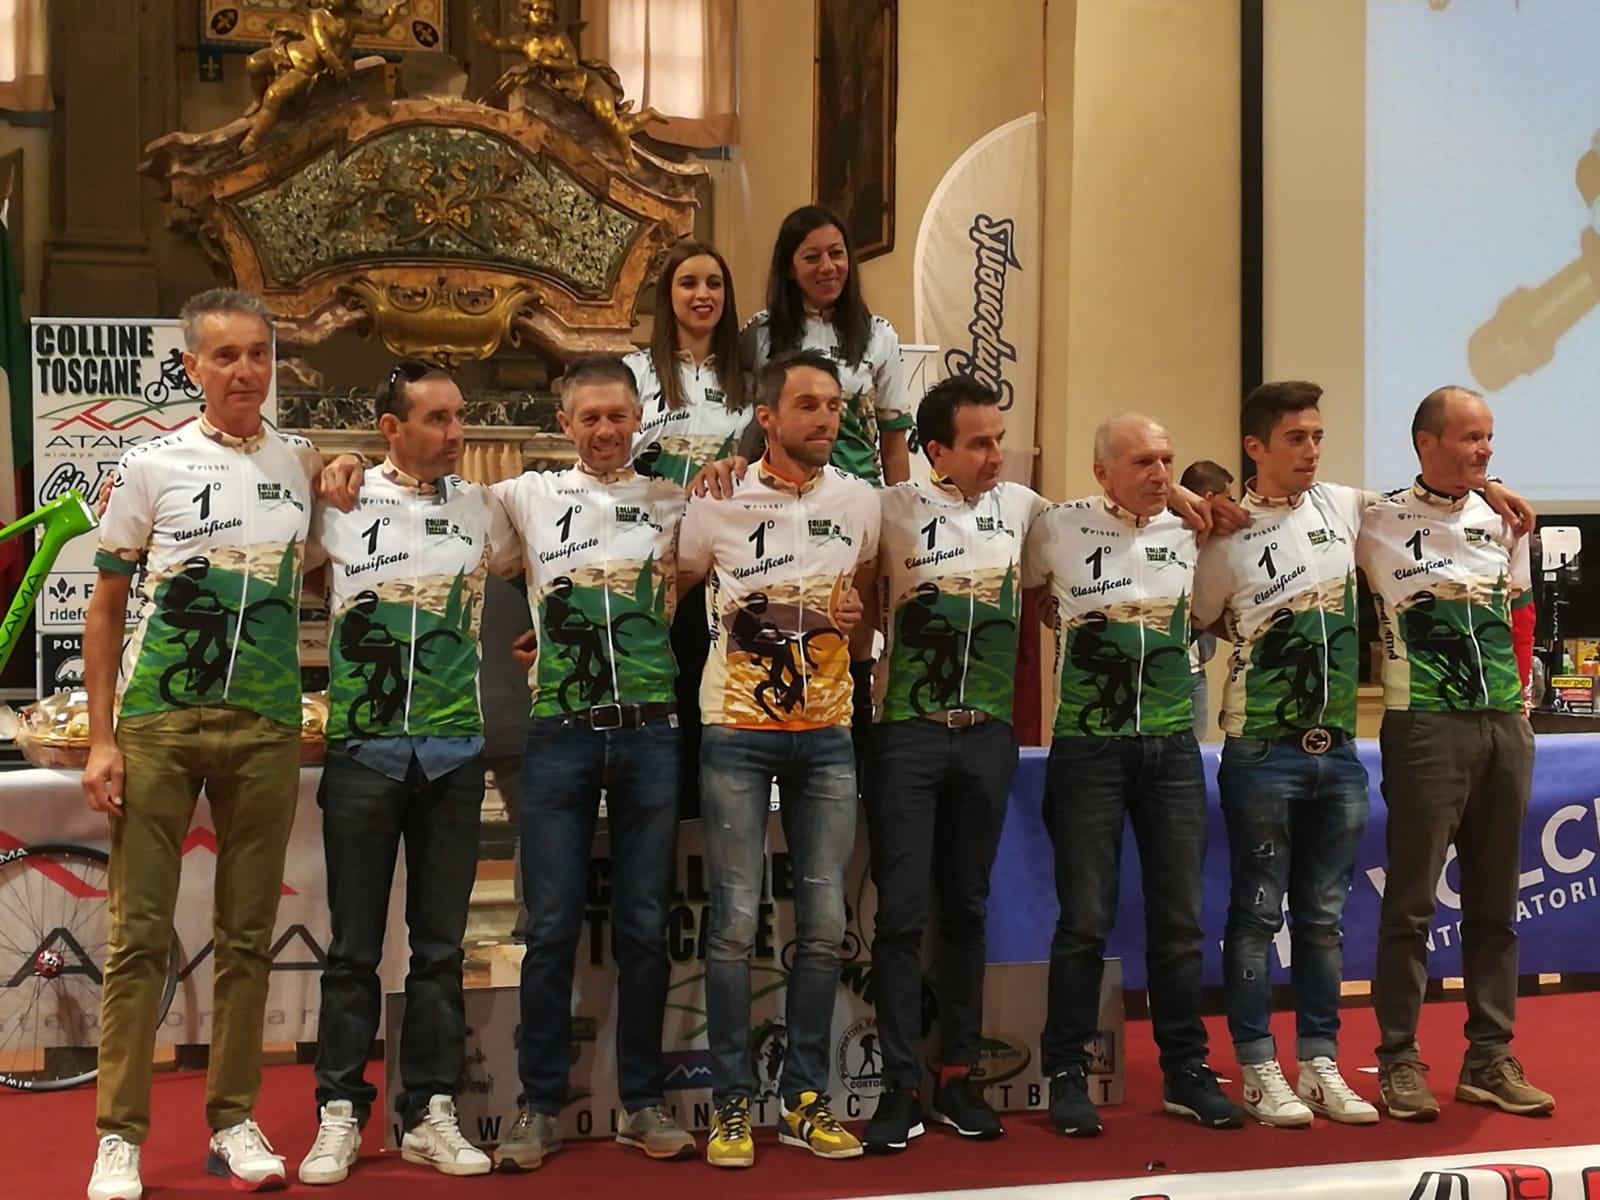 Colline Toscane MTB